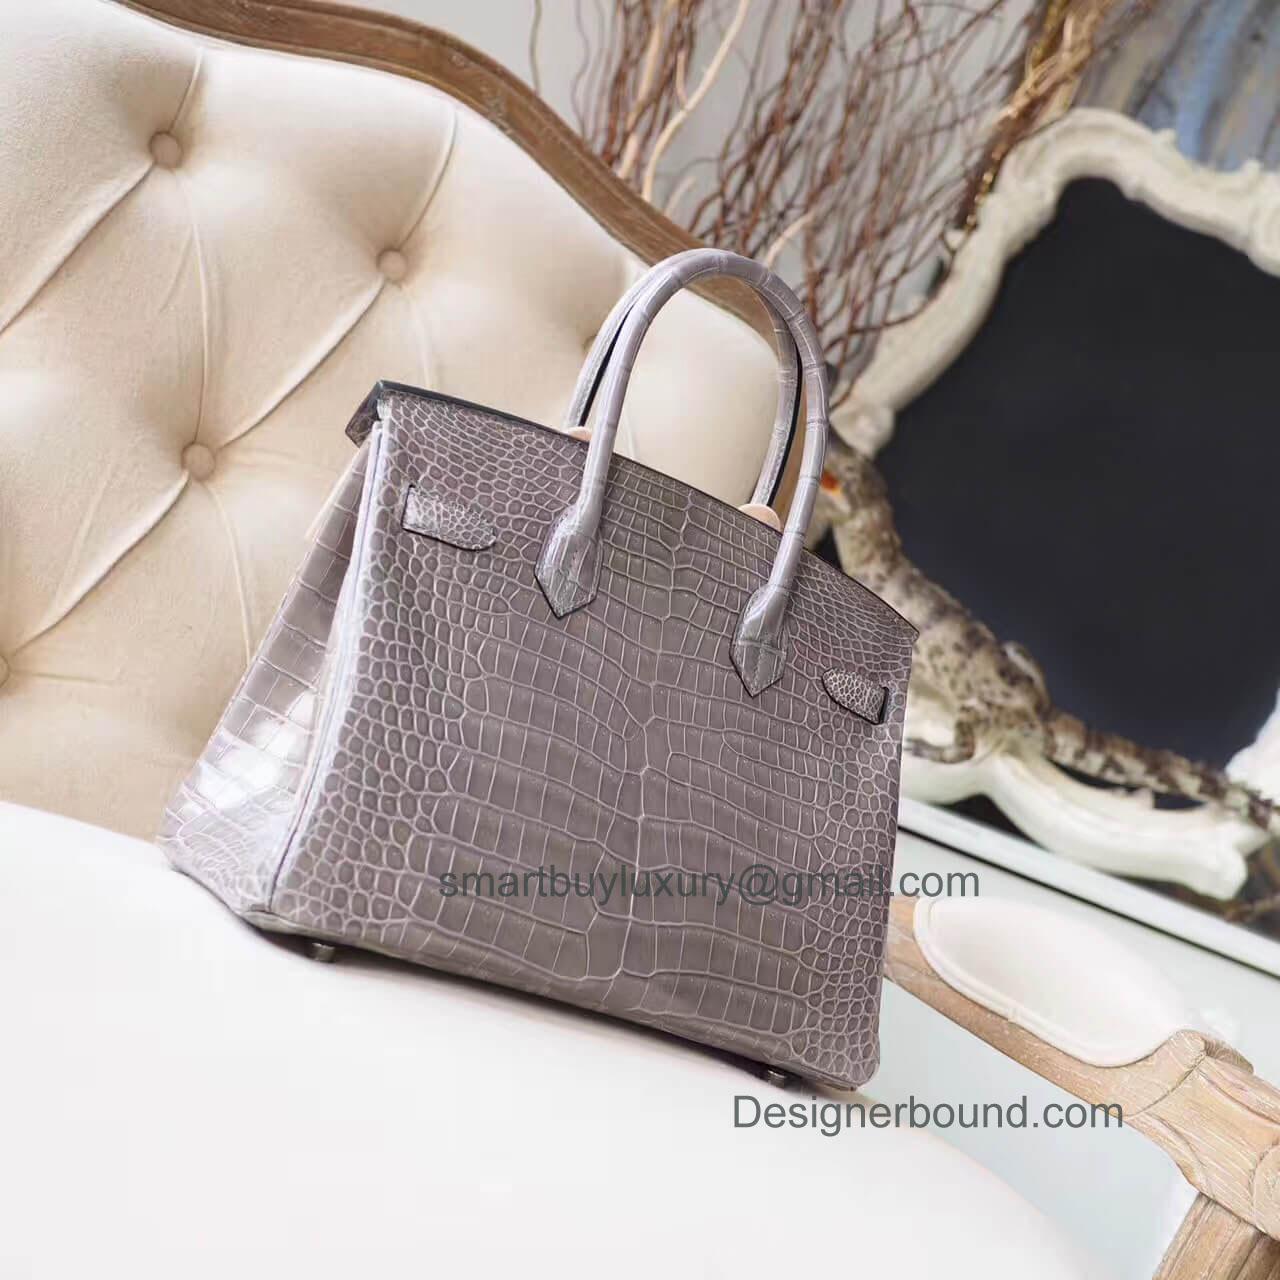 ab6a2340891 Hermes Birkin 30 Bag in Gris Tourterelle Shiny Porosus Croc PHW - Hermes  Replica